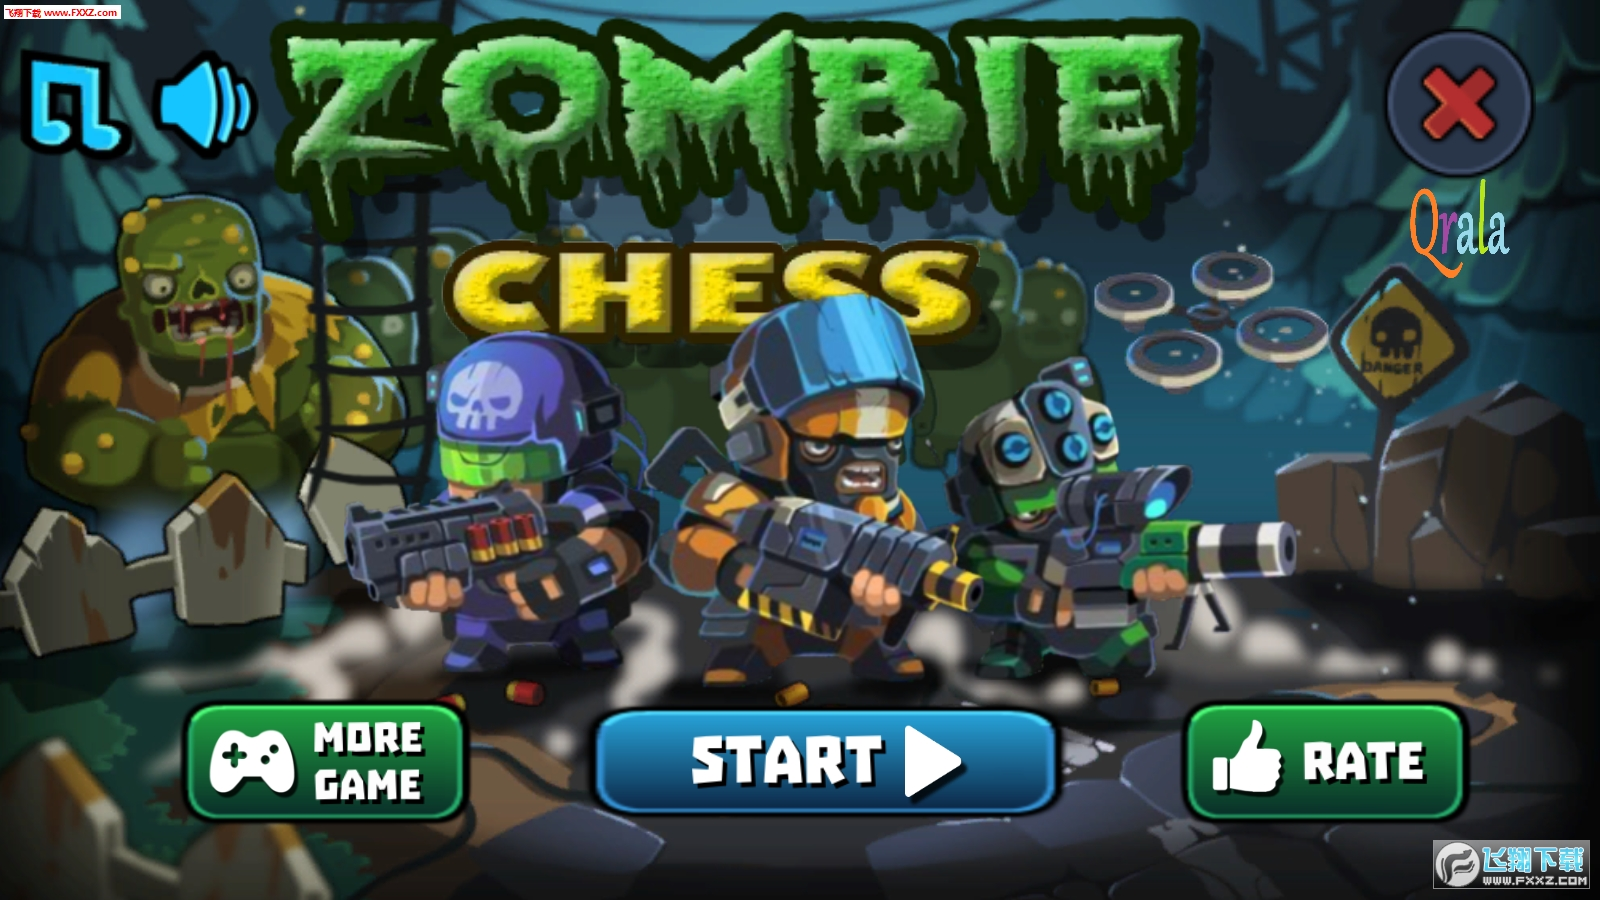 Zombie chess 2020免费游戏1.1.0.6.2截图0